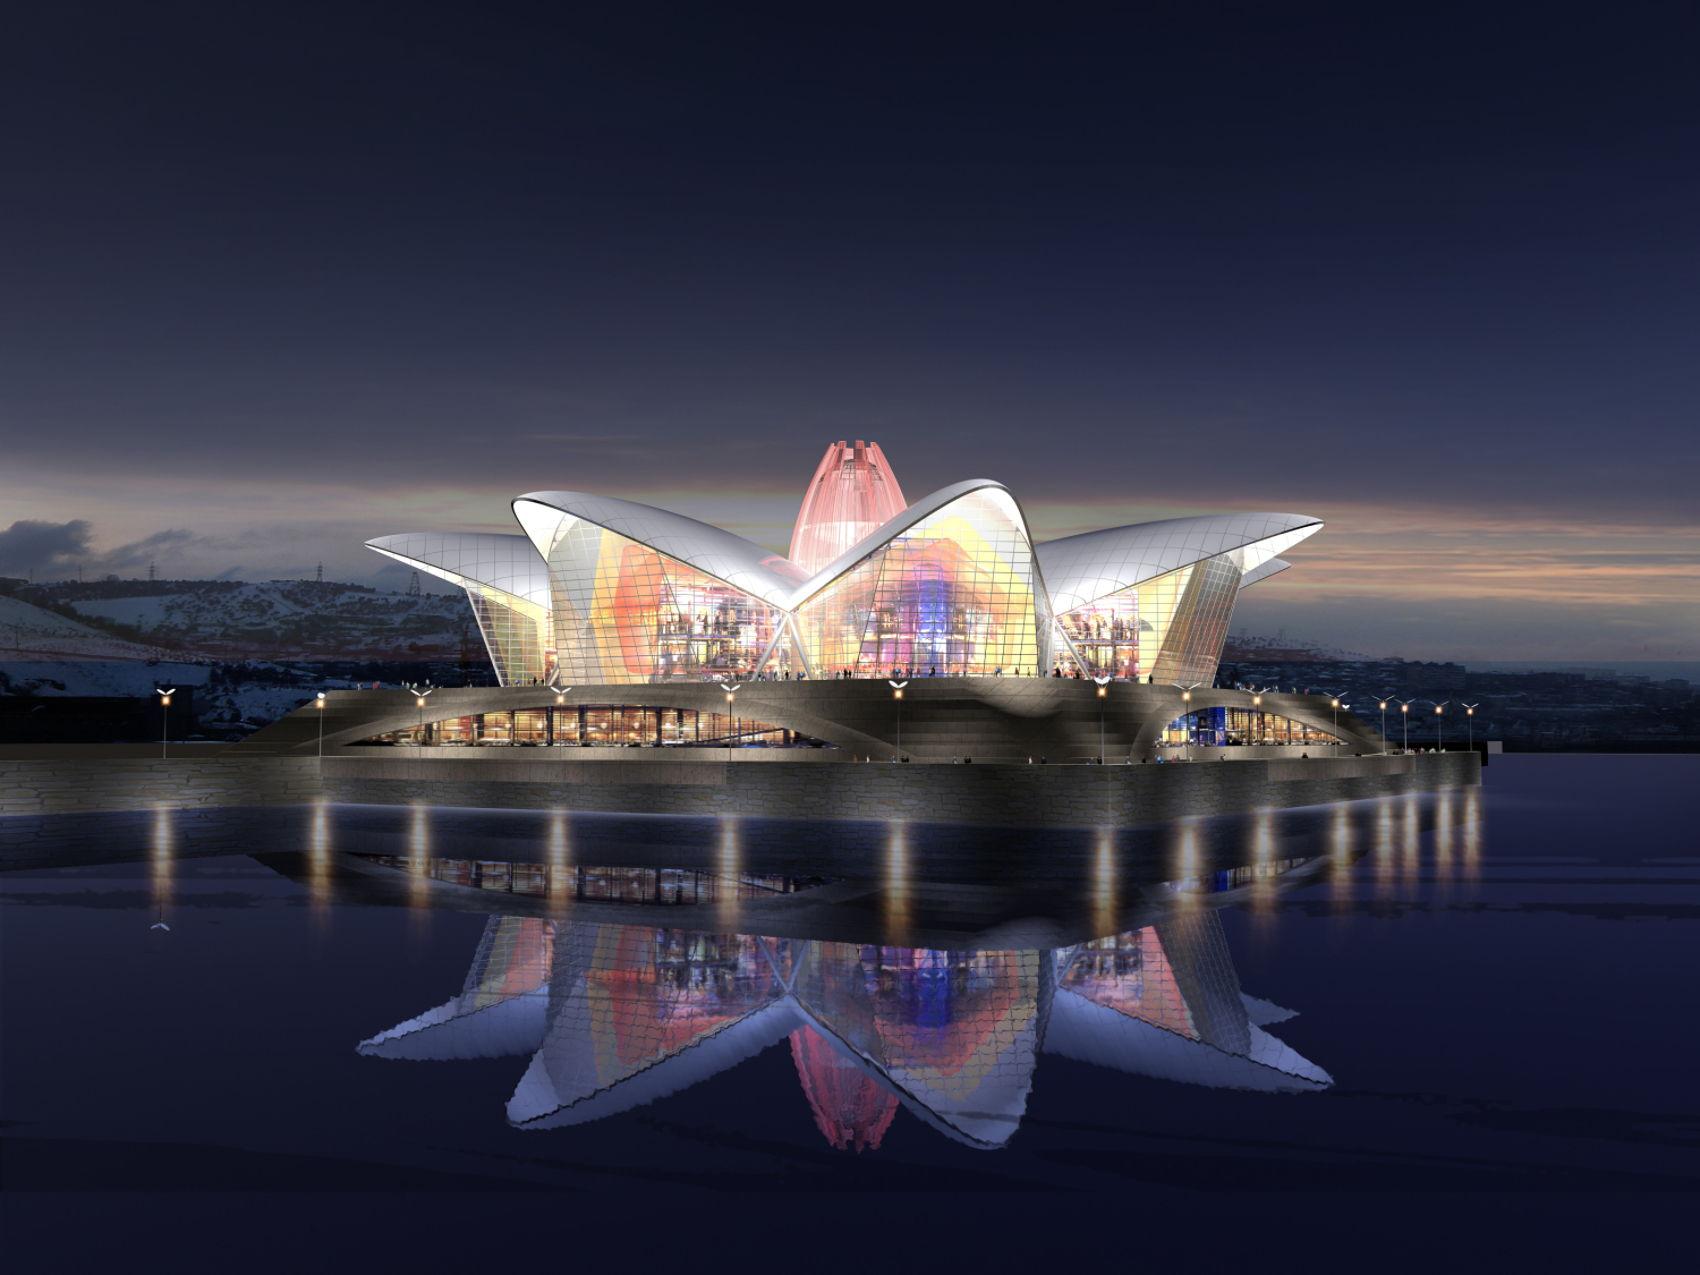 facade-outdoor-giant-led-screen-CYLINDER-FLEXIBLE-LED-DISPLAY-SCREEN-FOR-DENIZ-MALL-BAKU-AZERBAIJAN